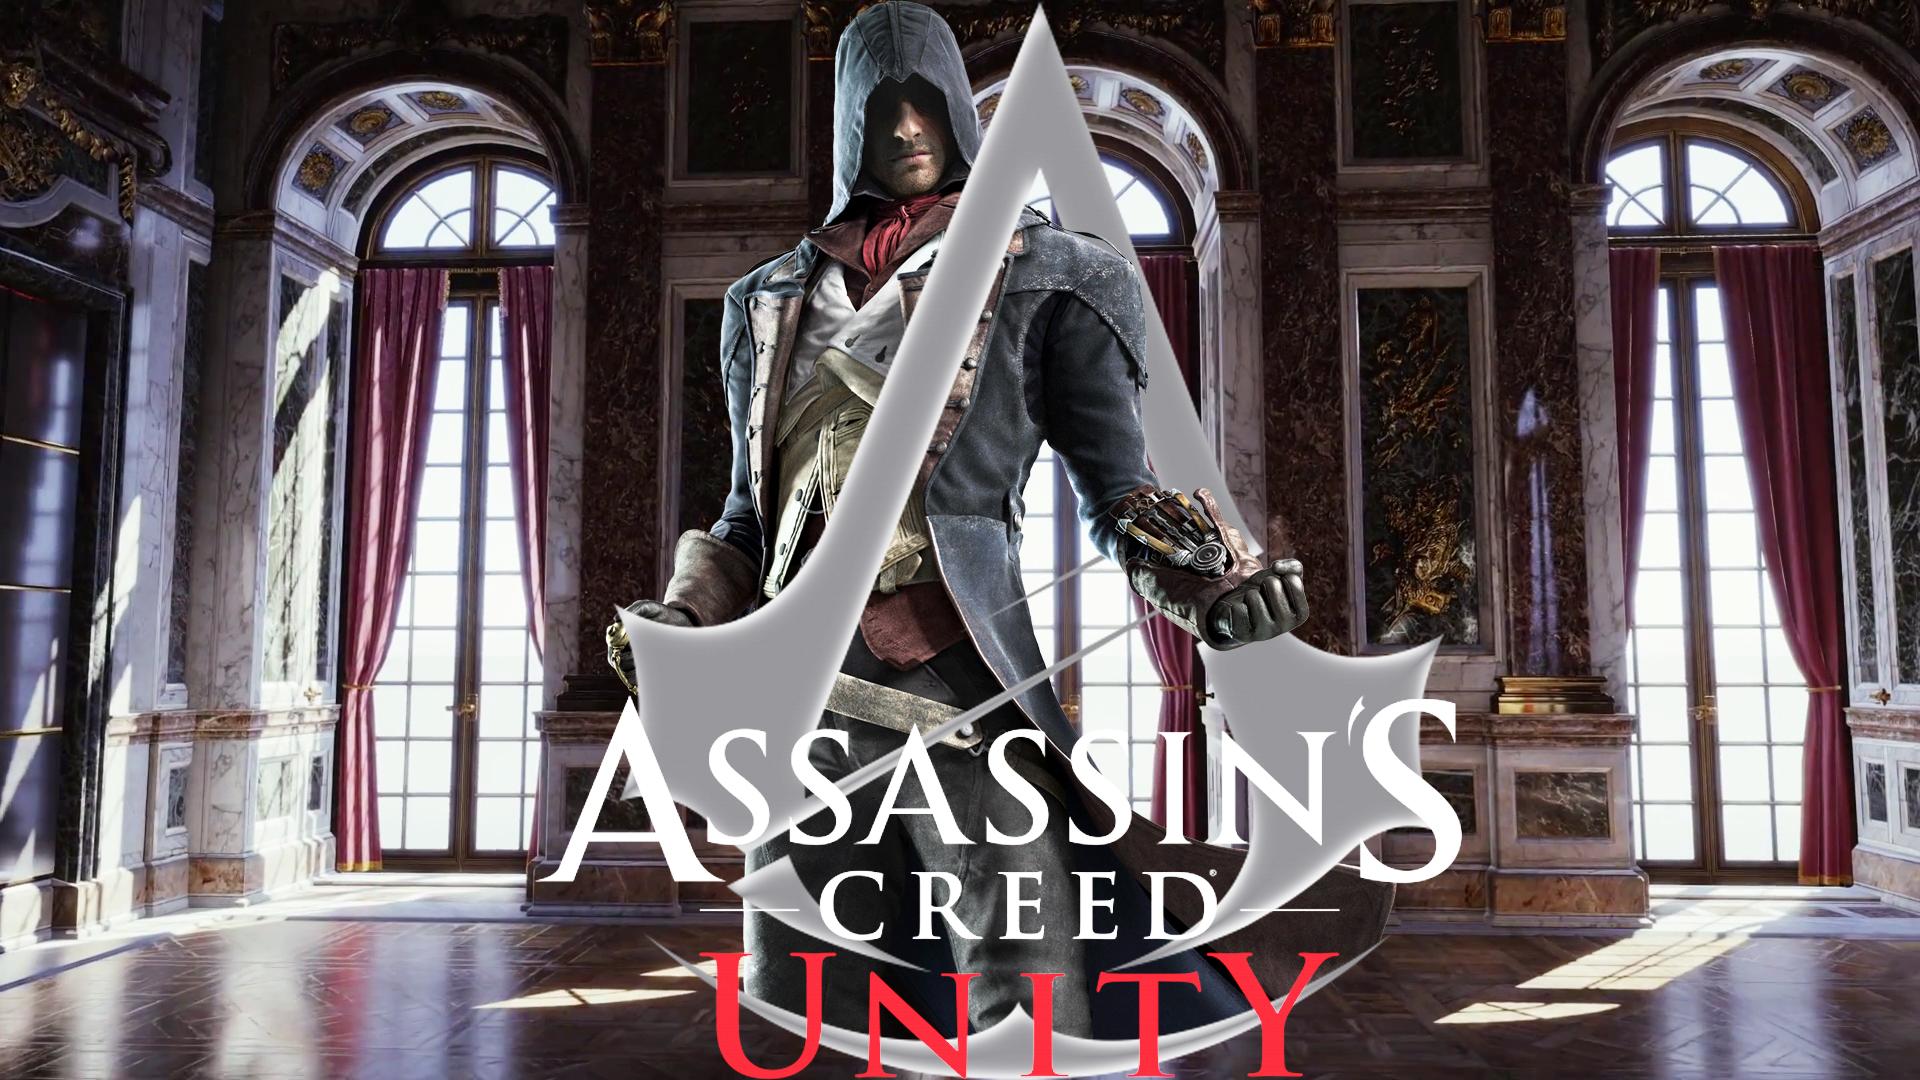 Assassin Creed 5- Unity HD Wallpaper by RajivCR7